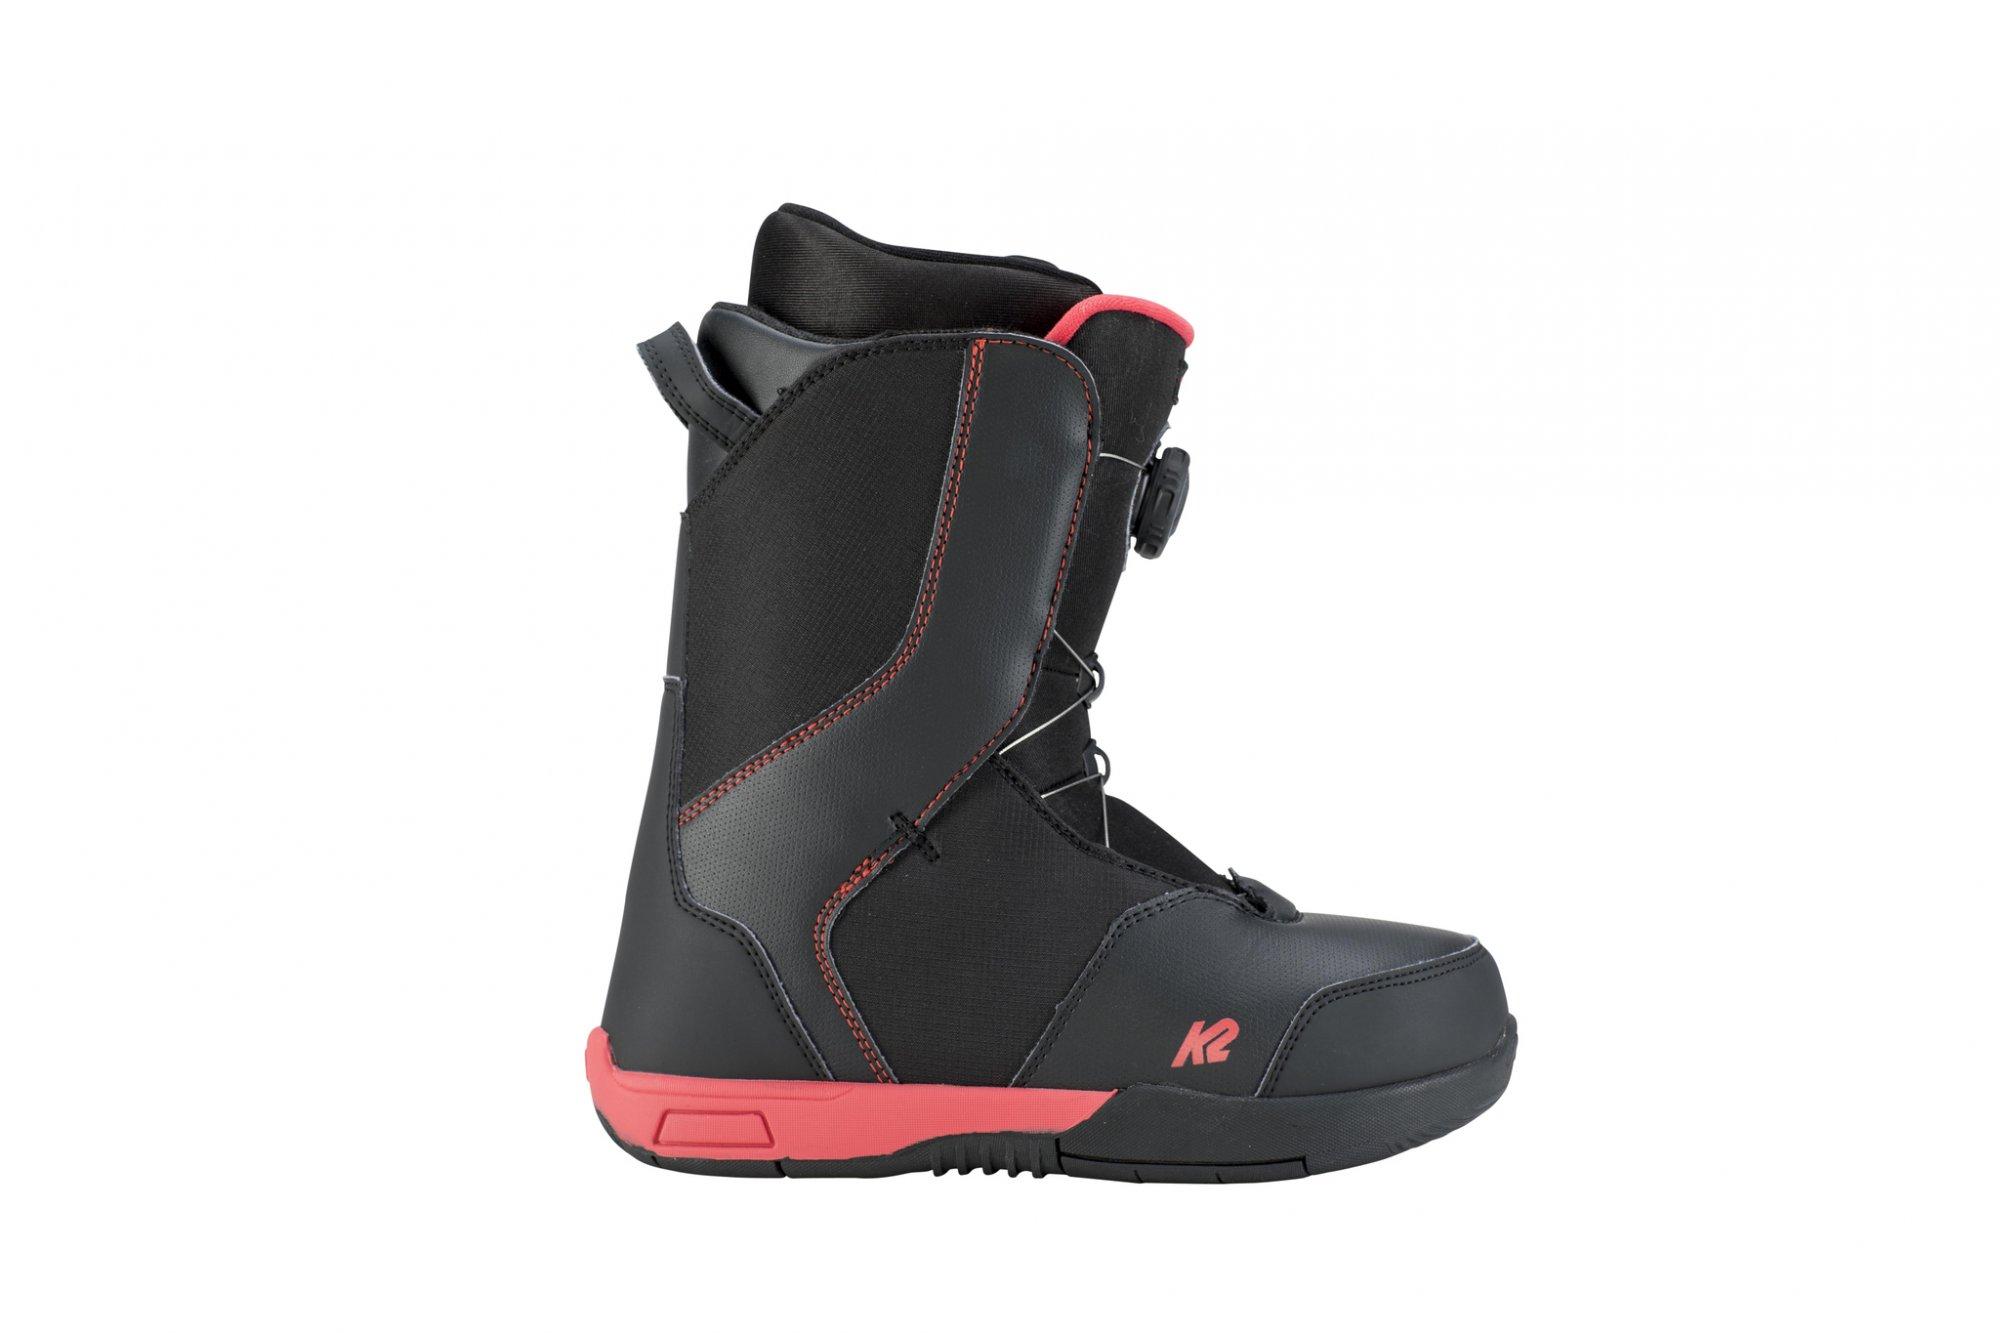 2020 K2 Vandal Snowboard Boots